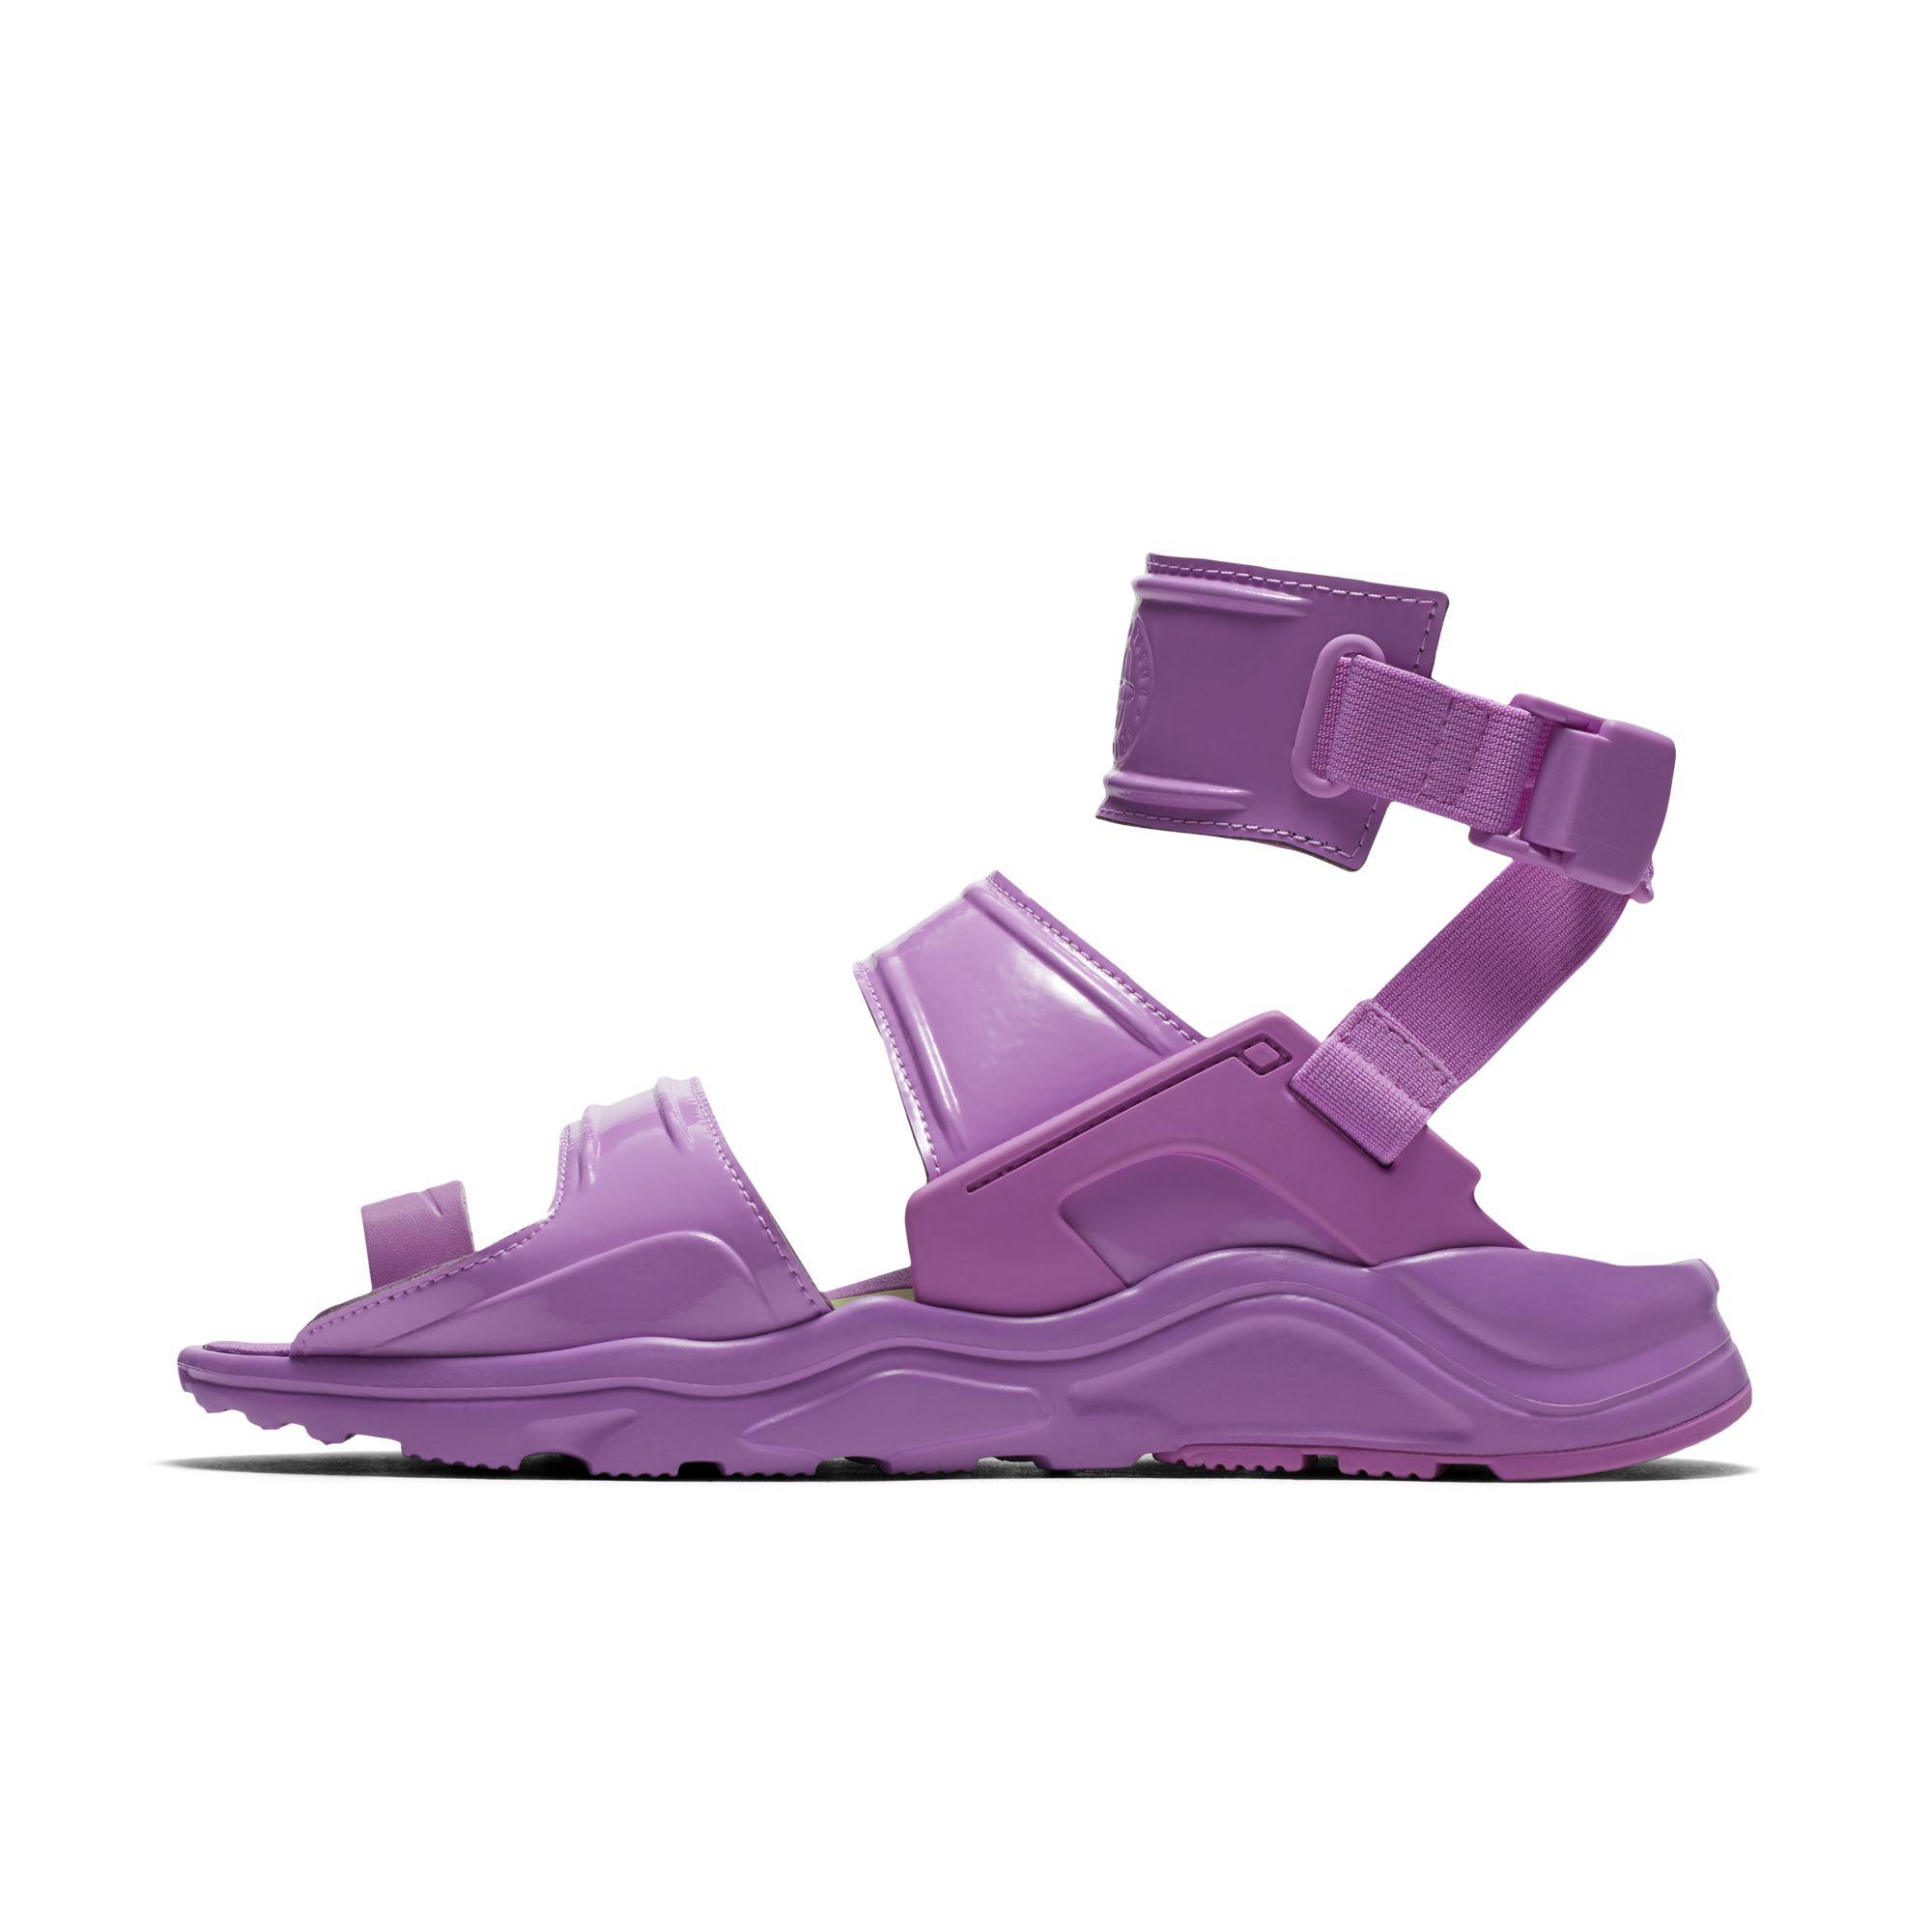 quickstrike nike air huarache gladiator sandals are coming